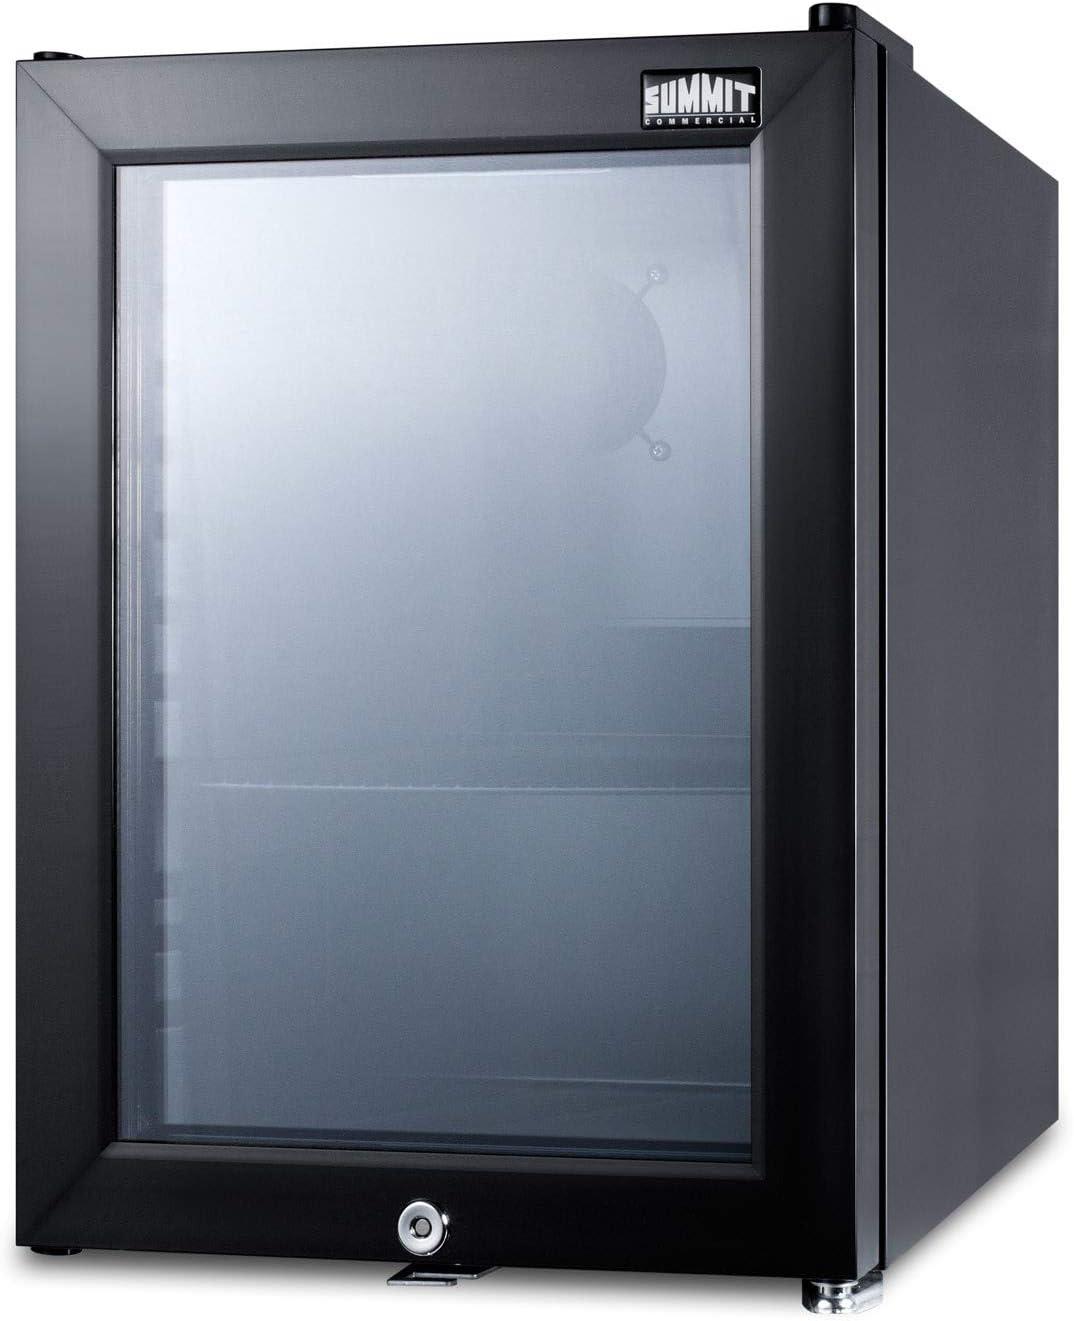 Summit SCR114L 14 Inch Compact Refrigerator in Black